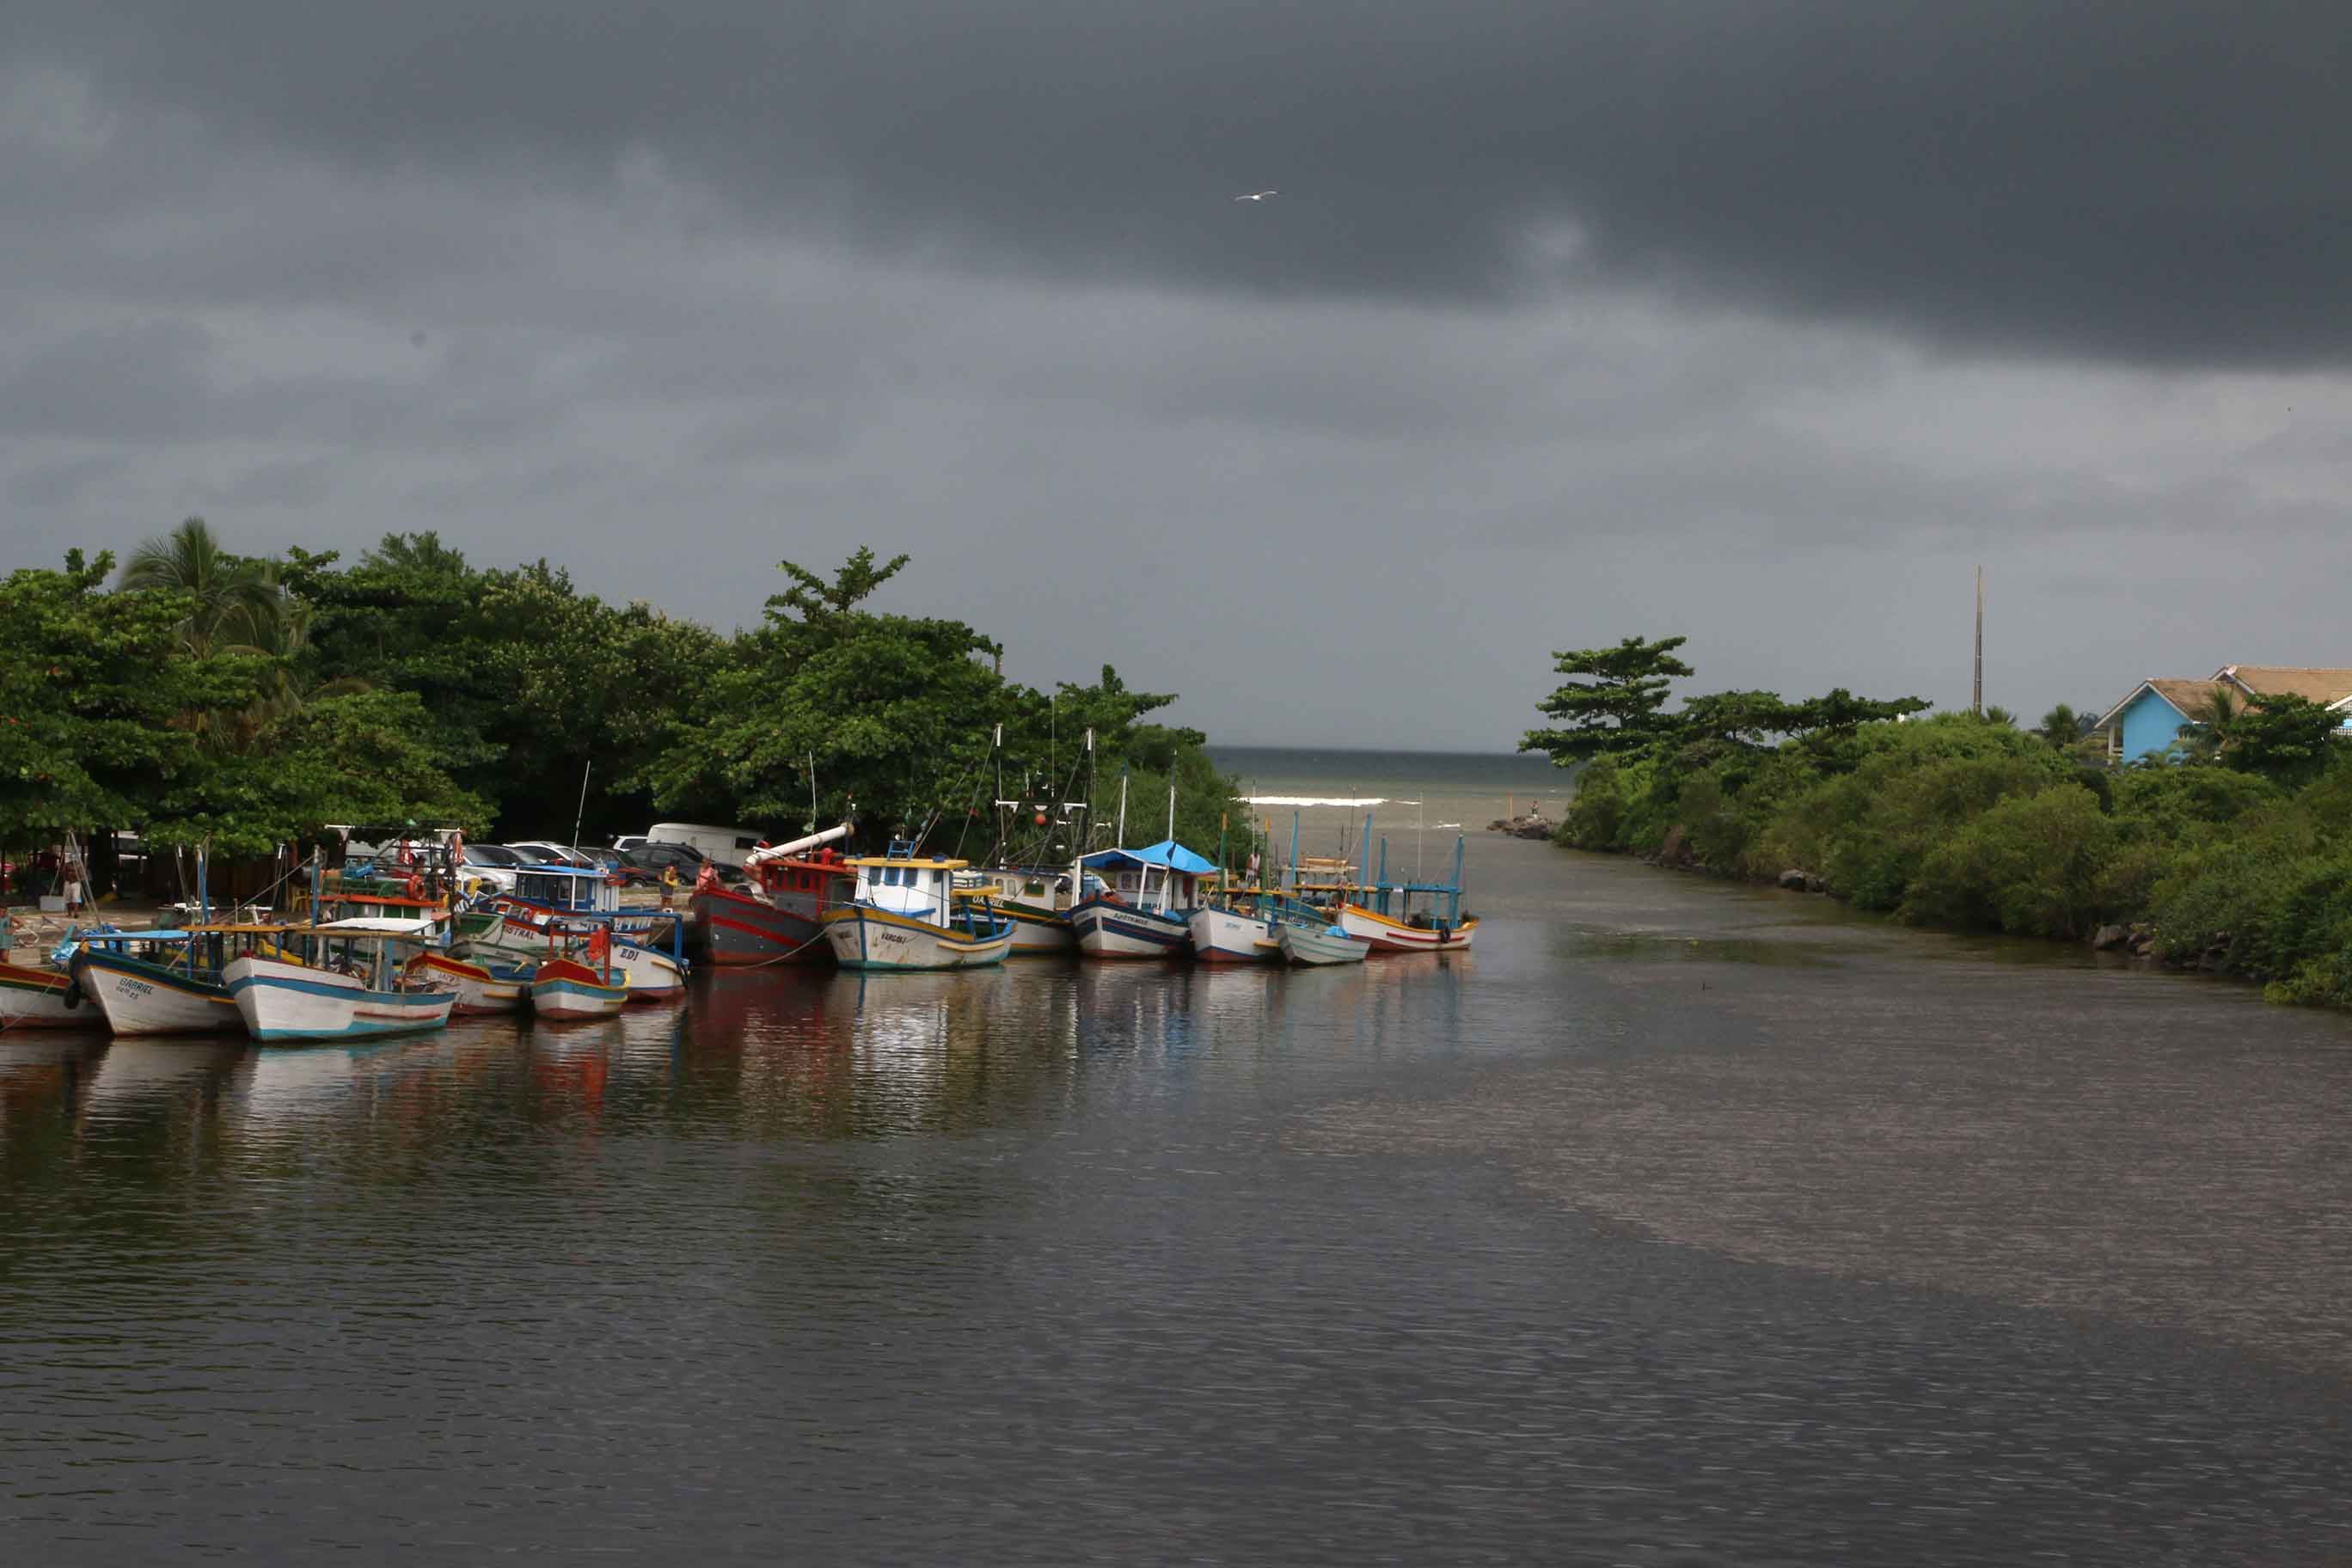 Peruibe-Meio-Ambiente-Rio-negro-IMG_7325-bx